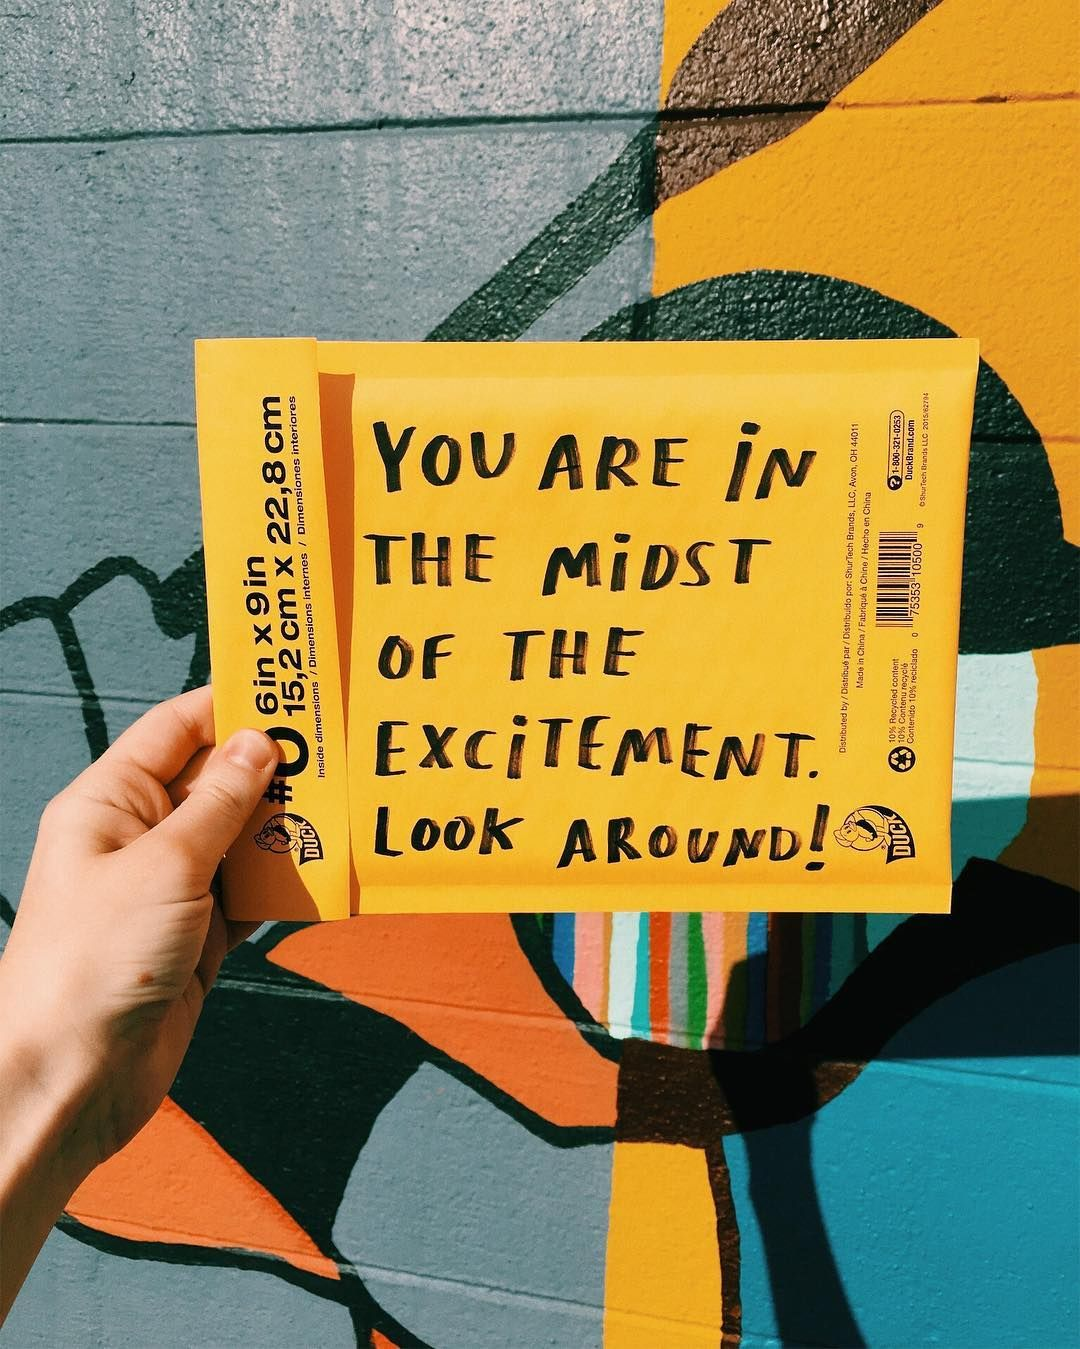 Pin by Mila Brunnette on Phrases | Pinterest | Trust, Positivity and ...